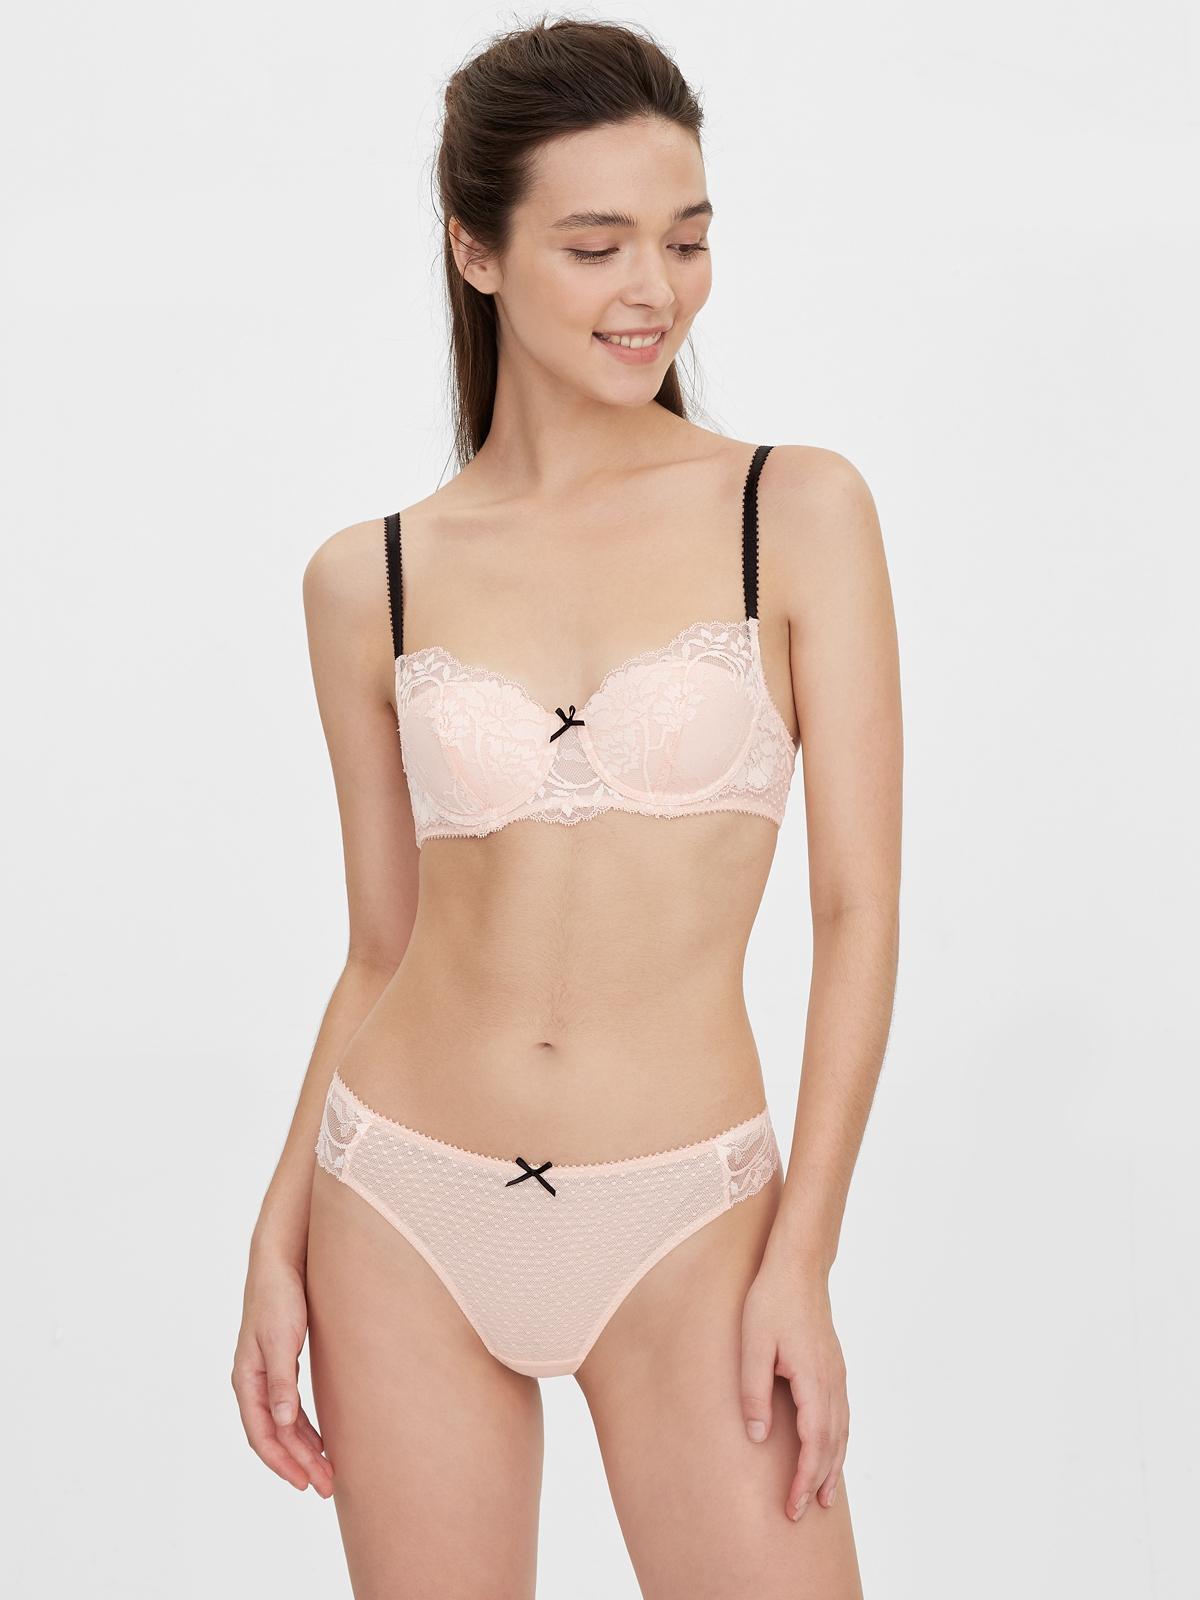 Boudoir By Disaya Juliette Premium Lace GString Panty N